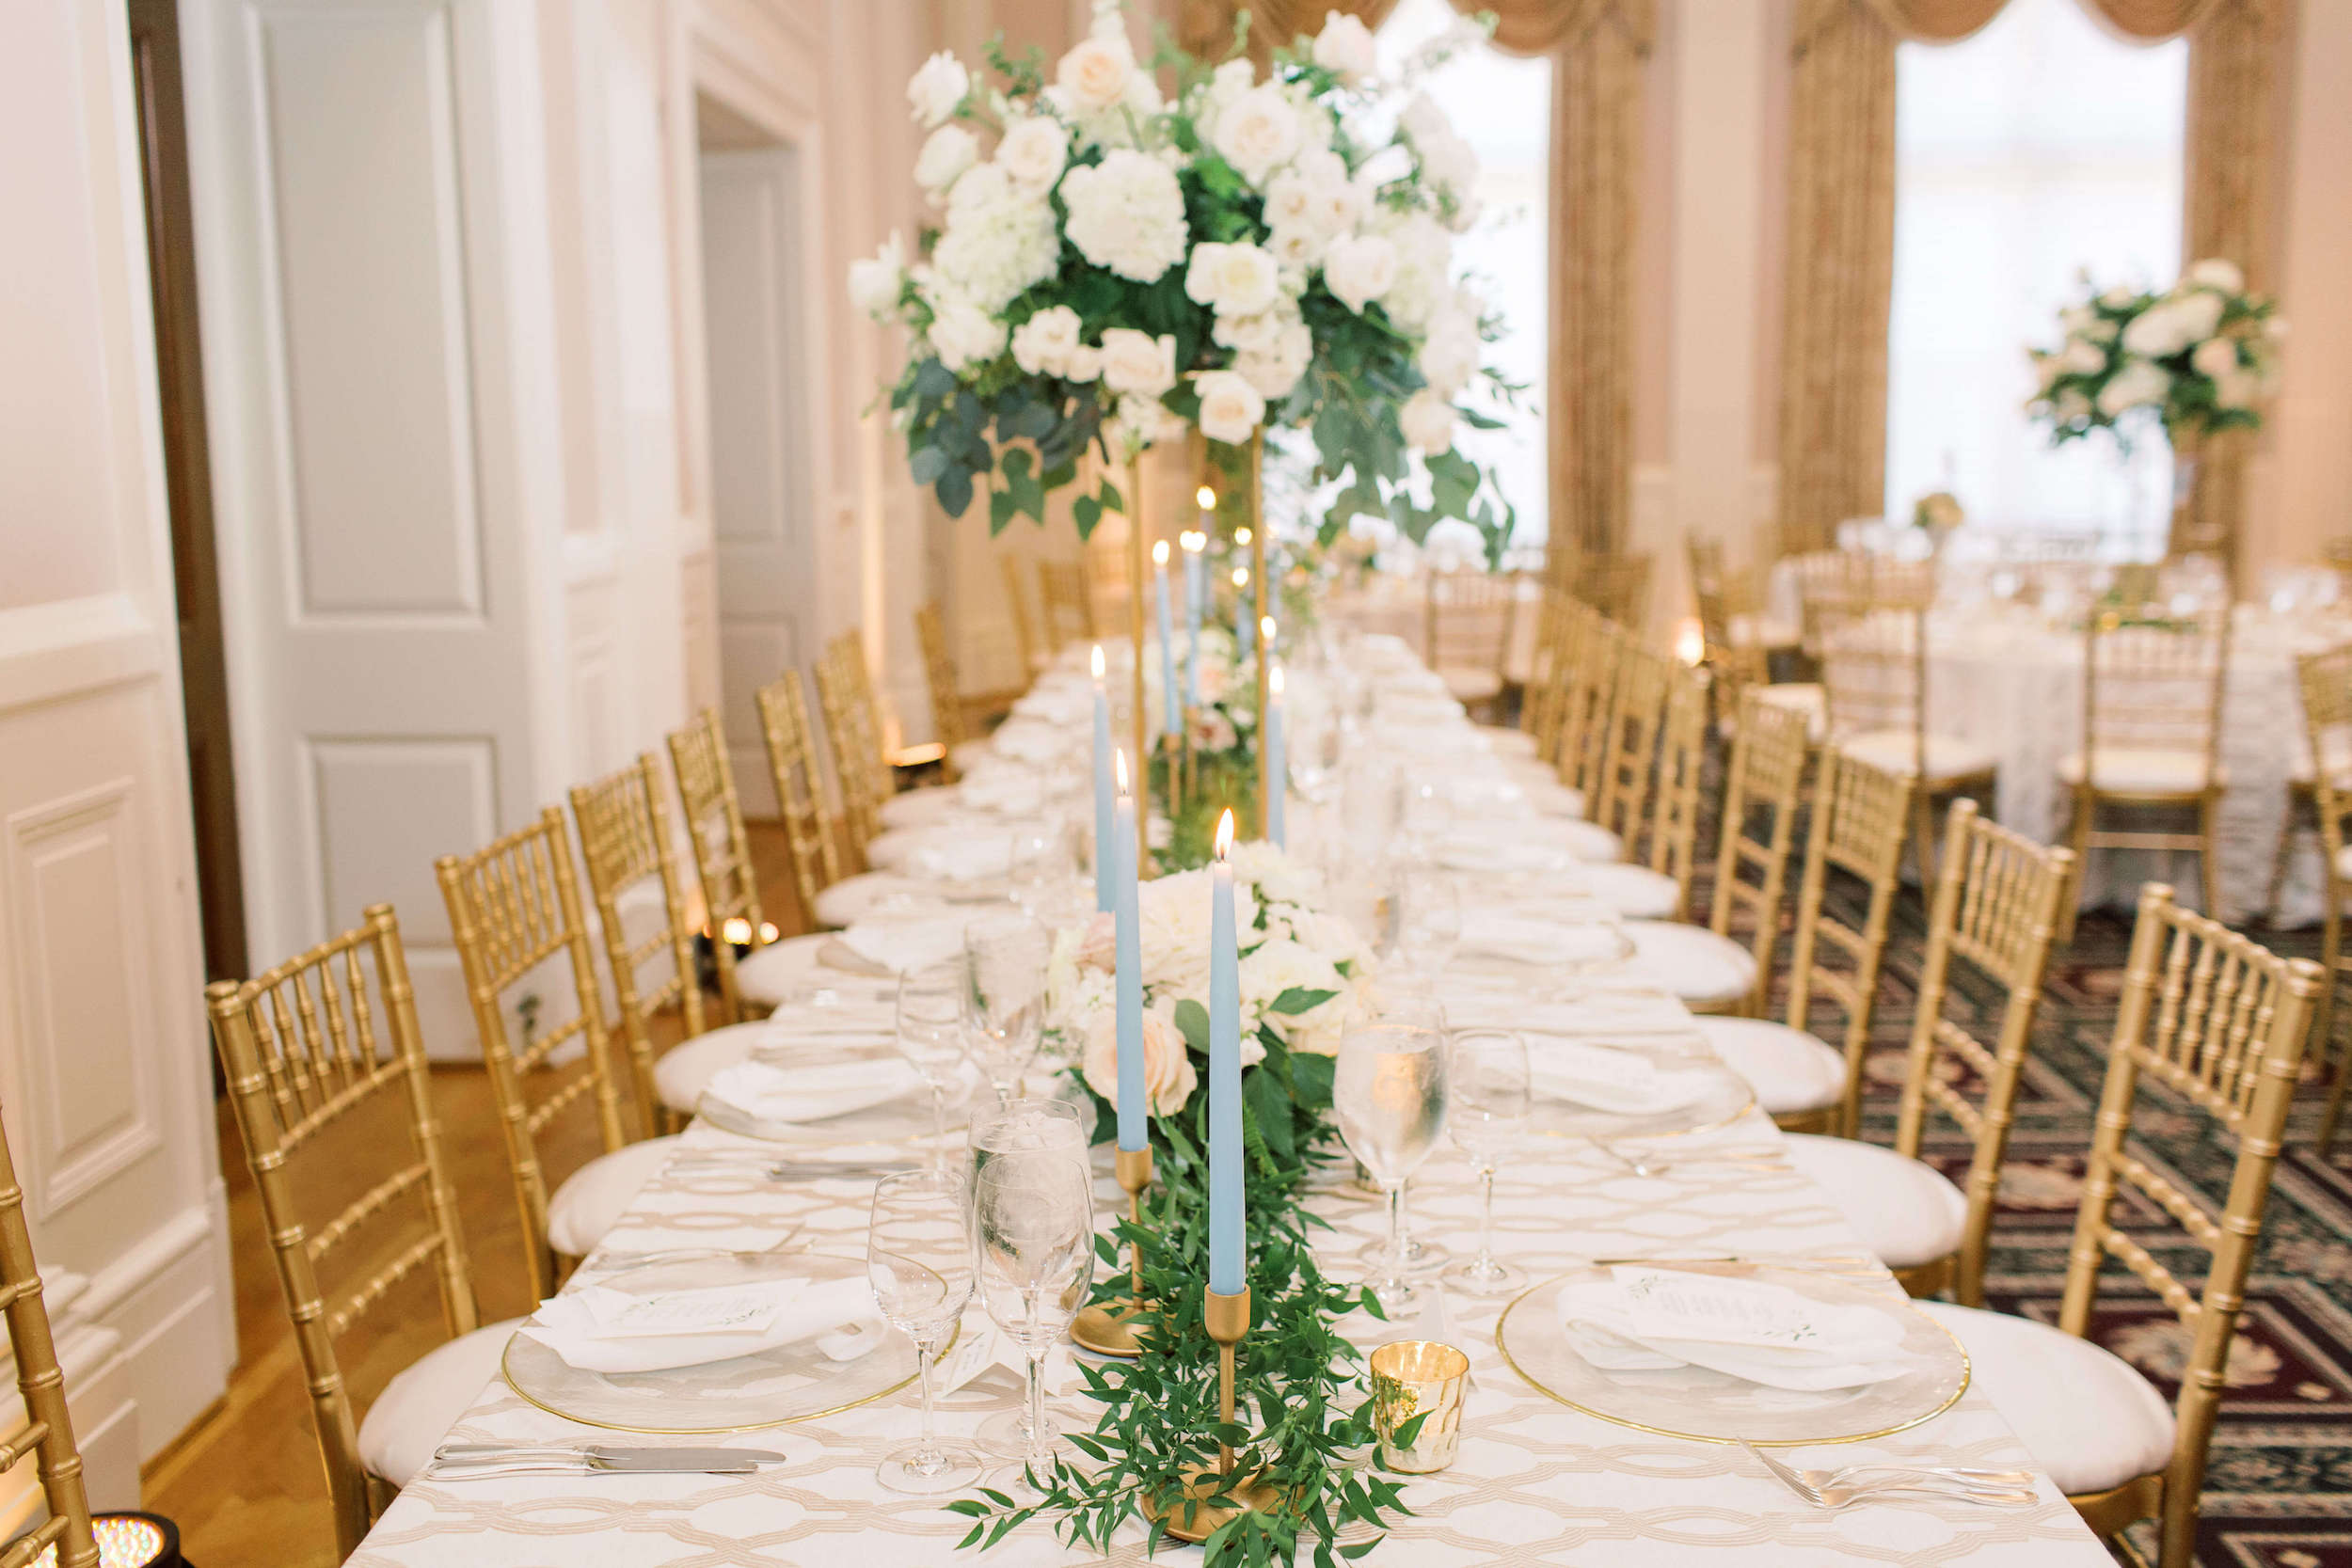 Carnegie institution for science wedding  (1).jpg